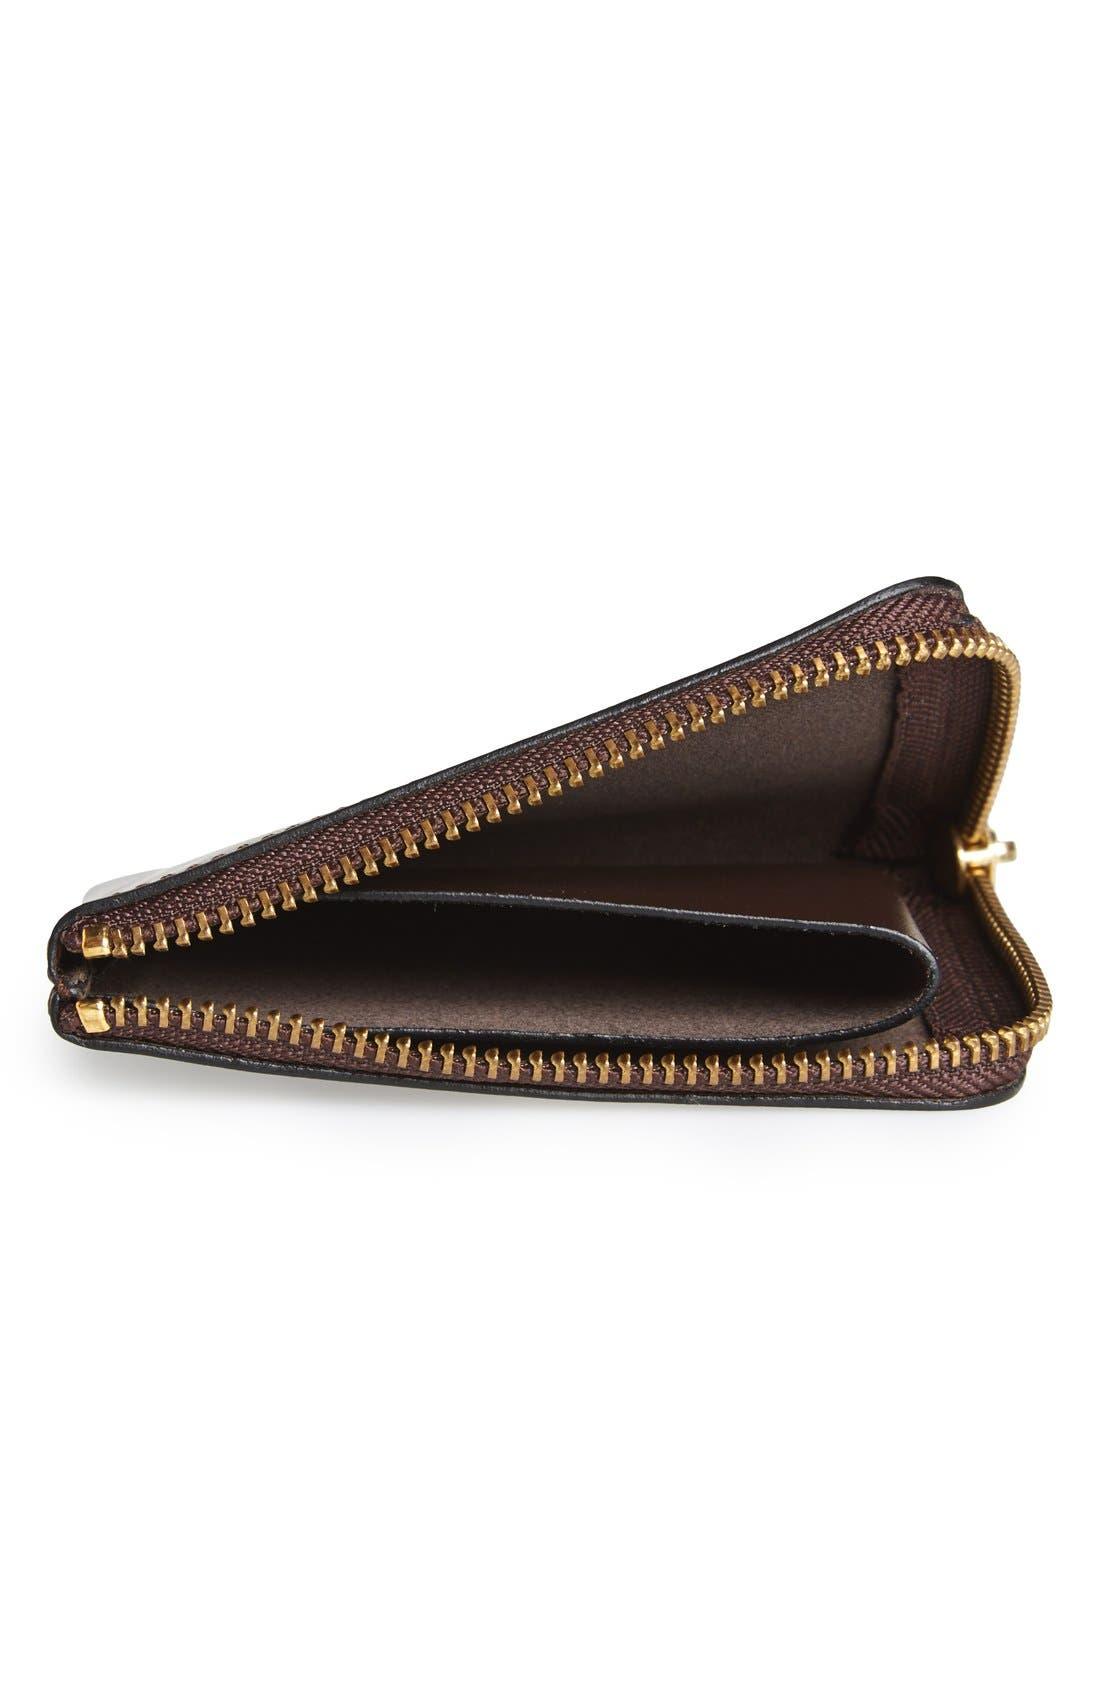 ,                             Half-Zip Leather Wallet,                             Alternate thumbnail 8, color,                             200